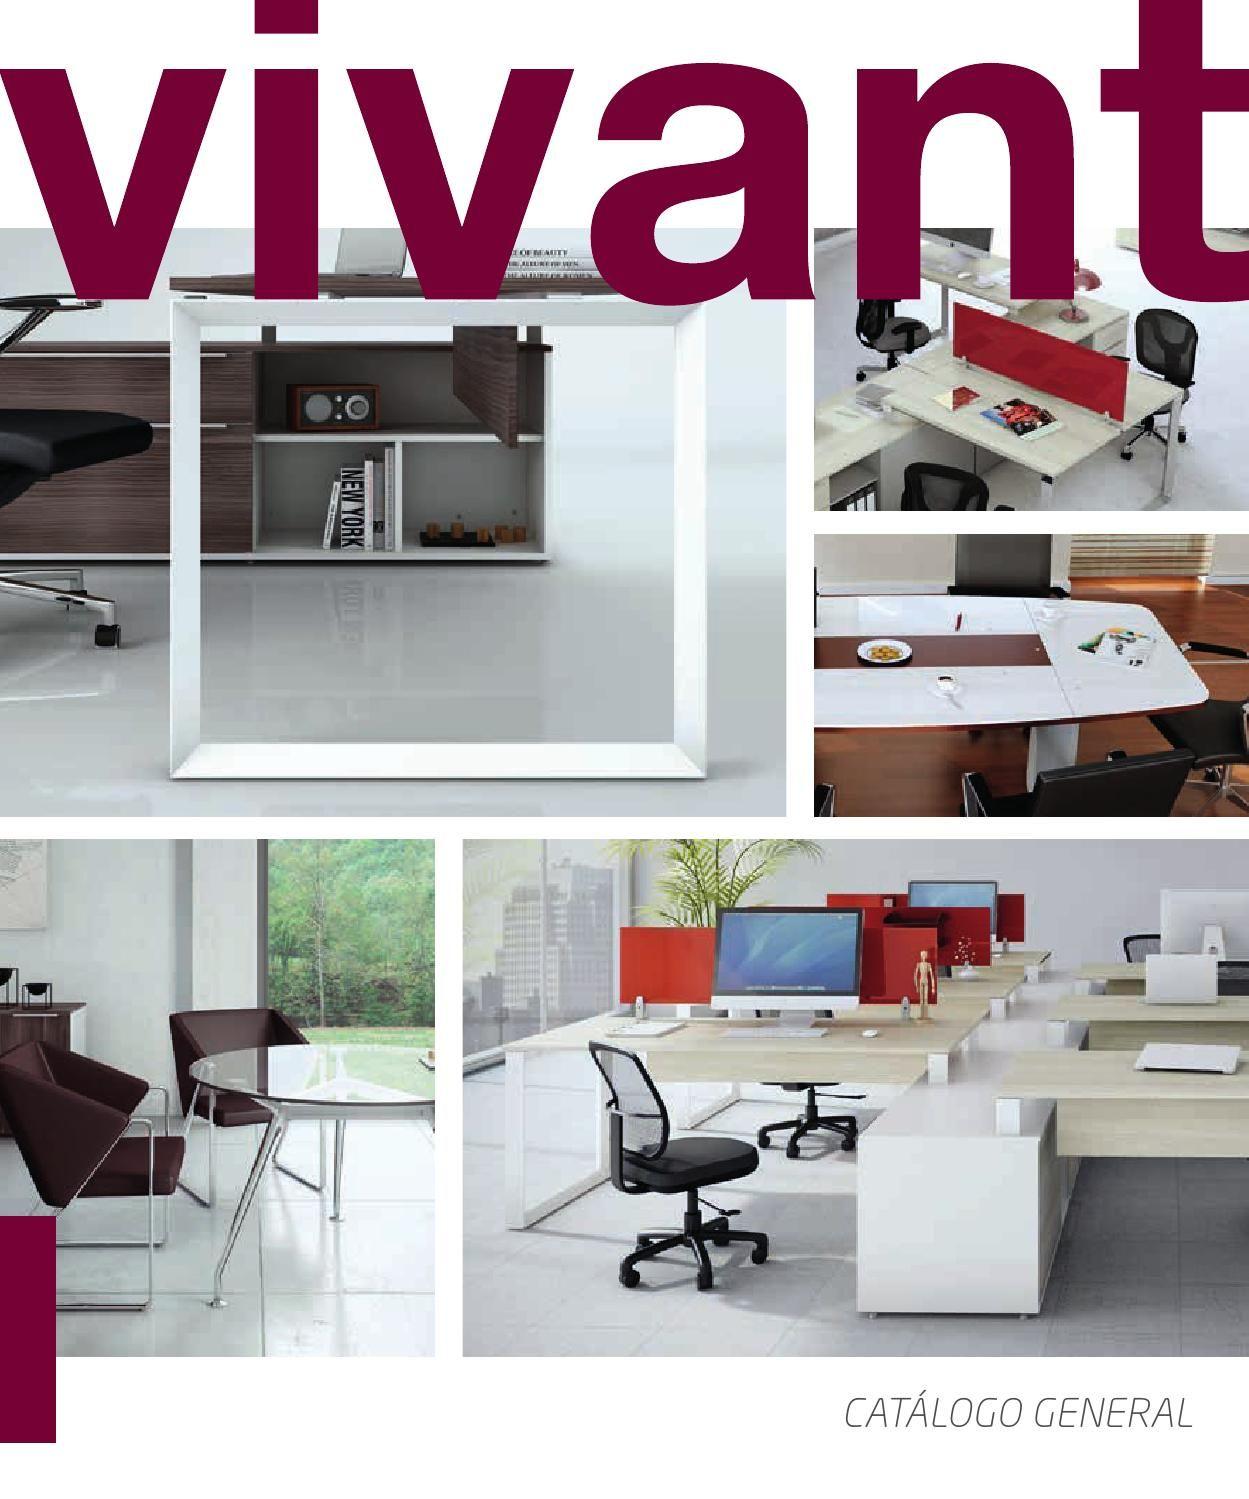 Vivant catalogo mobiliario oficina mobiliario oficina for Mobiliario de oficina precios